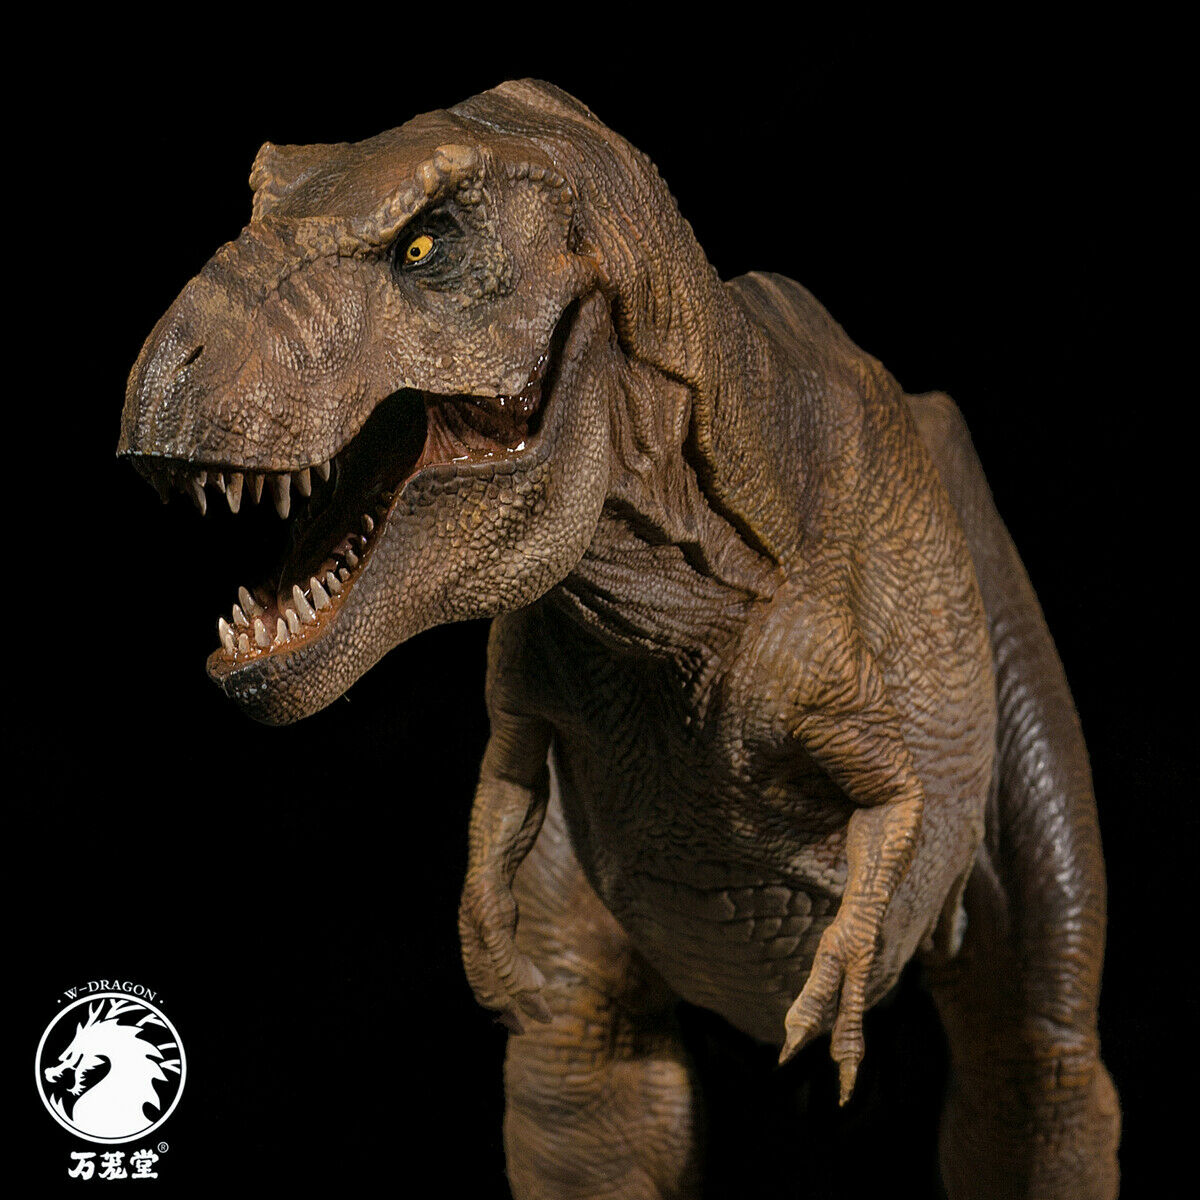 PRE-ORDER!!W-Dragon 1:35 Scale Rexy Statue Female Tyrannosaurus Rex Jurassic Dinosaur T-Rex Collector Dino Adults Toy Gift